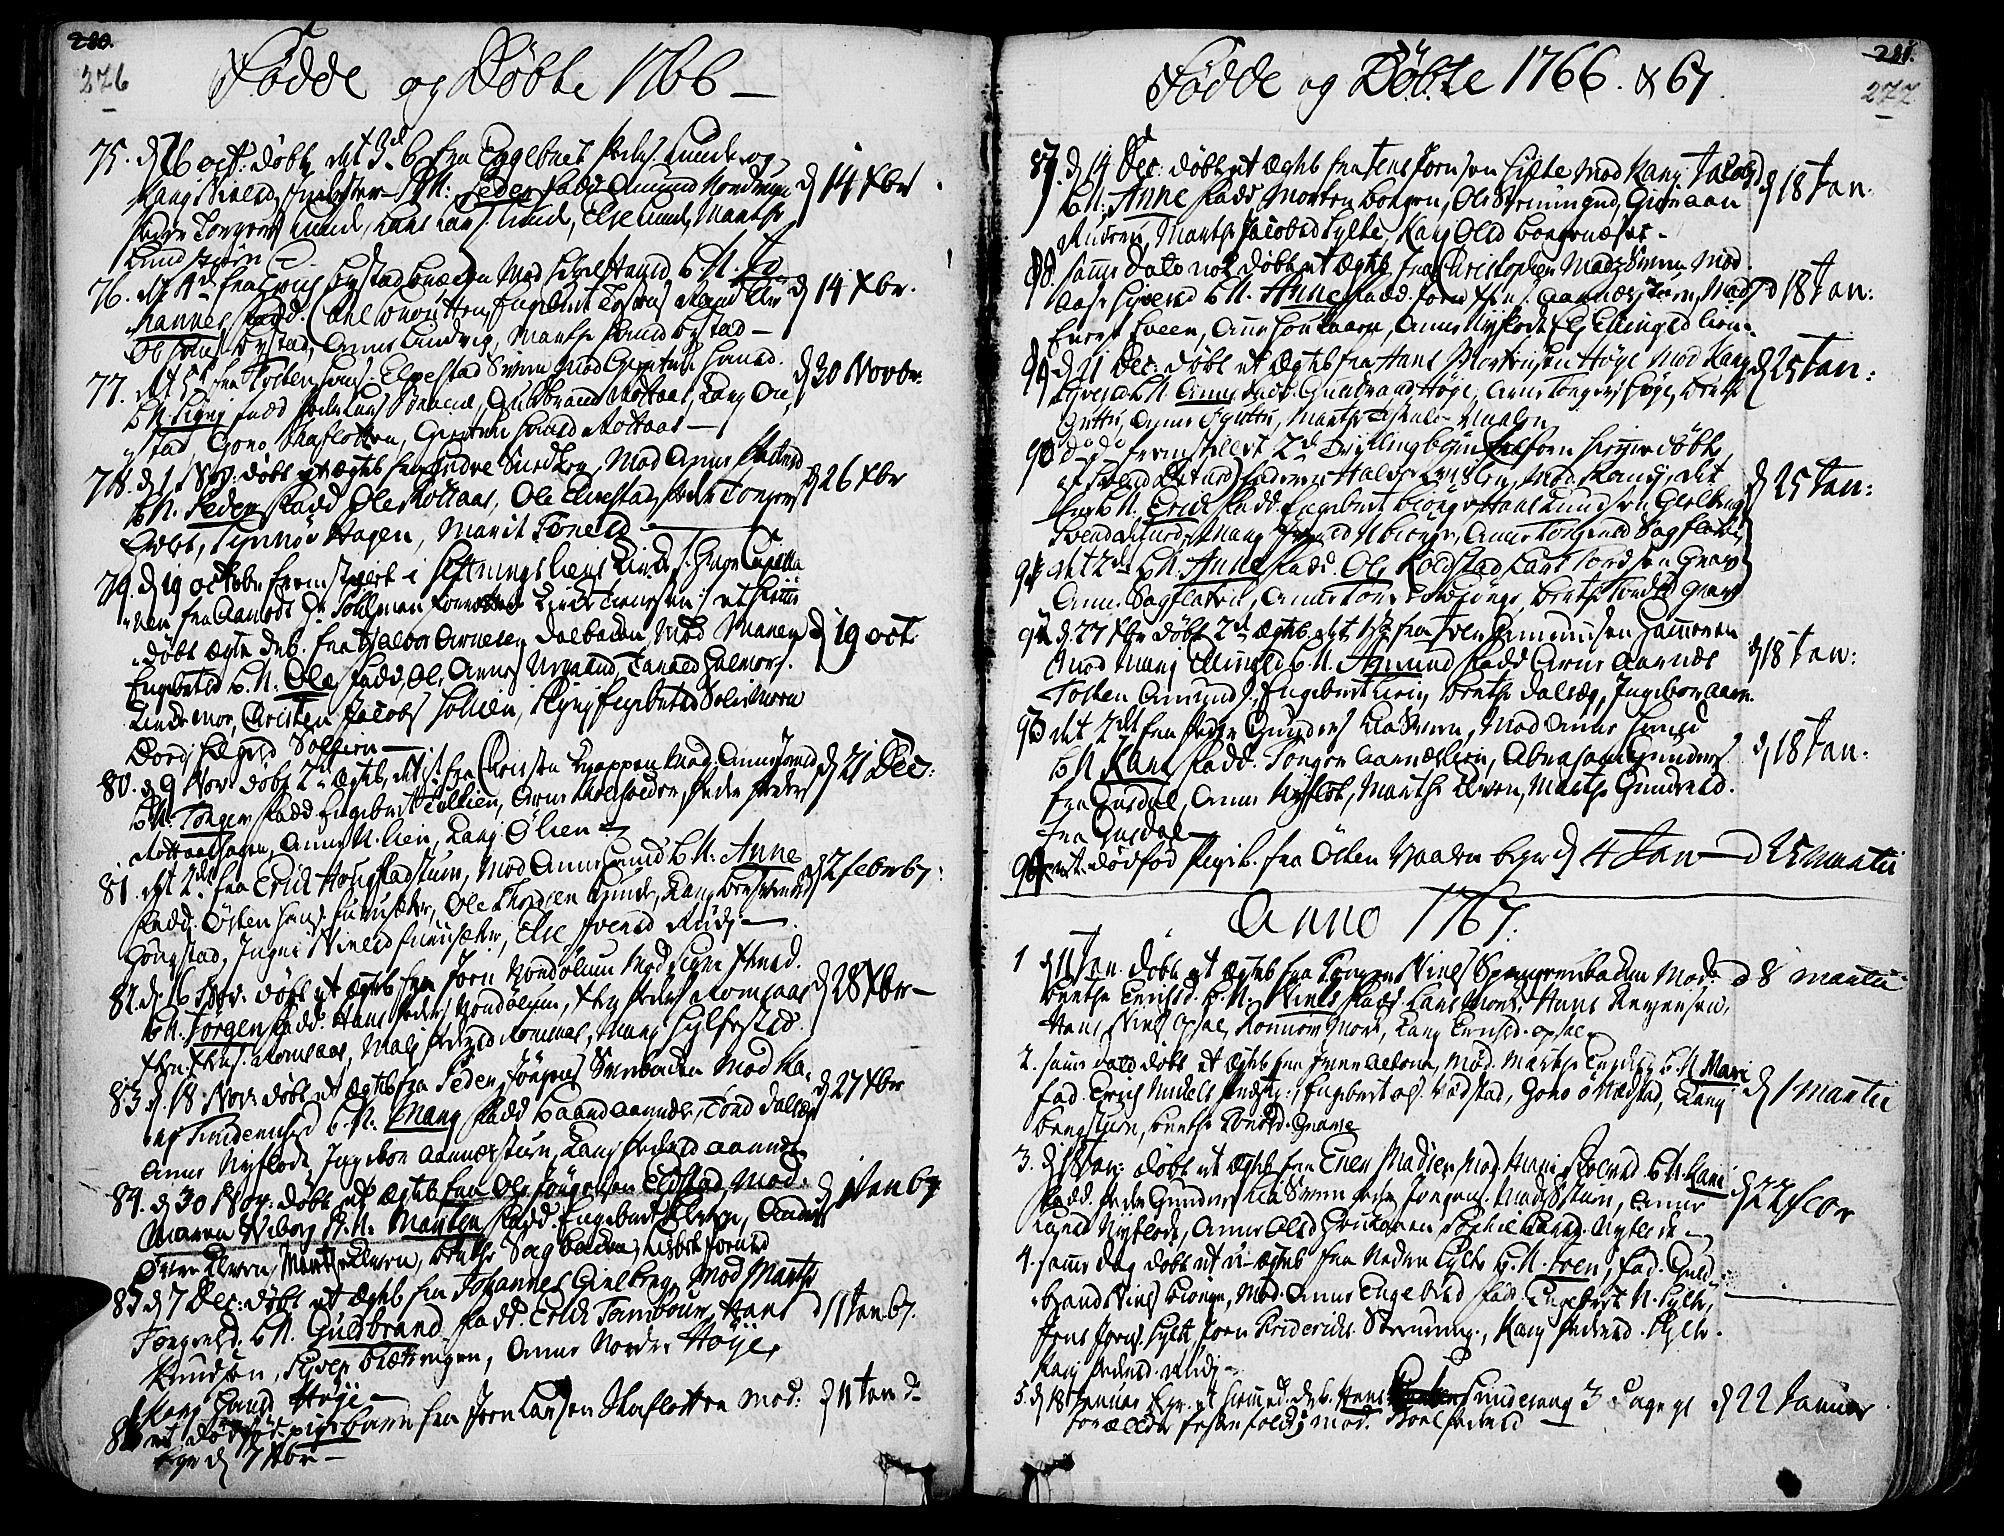 SAH, Ringebu prestekontor, Ministerialbok nr. 2, 1734-1780, s. 276-277